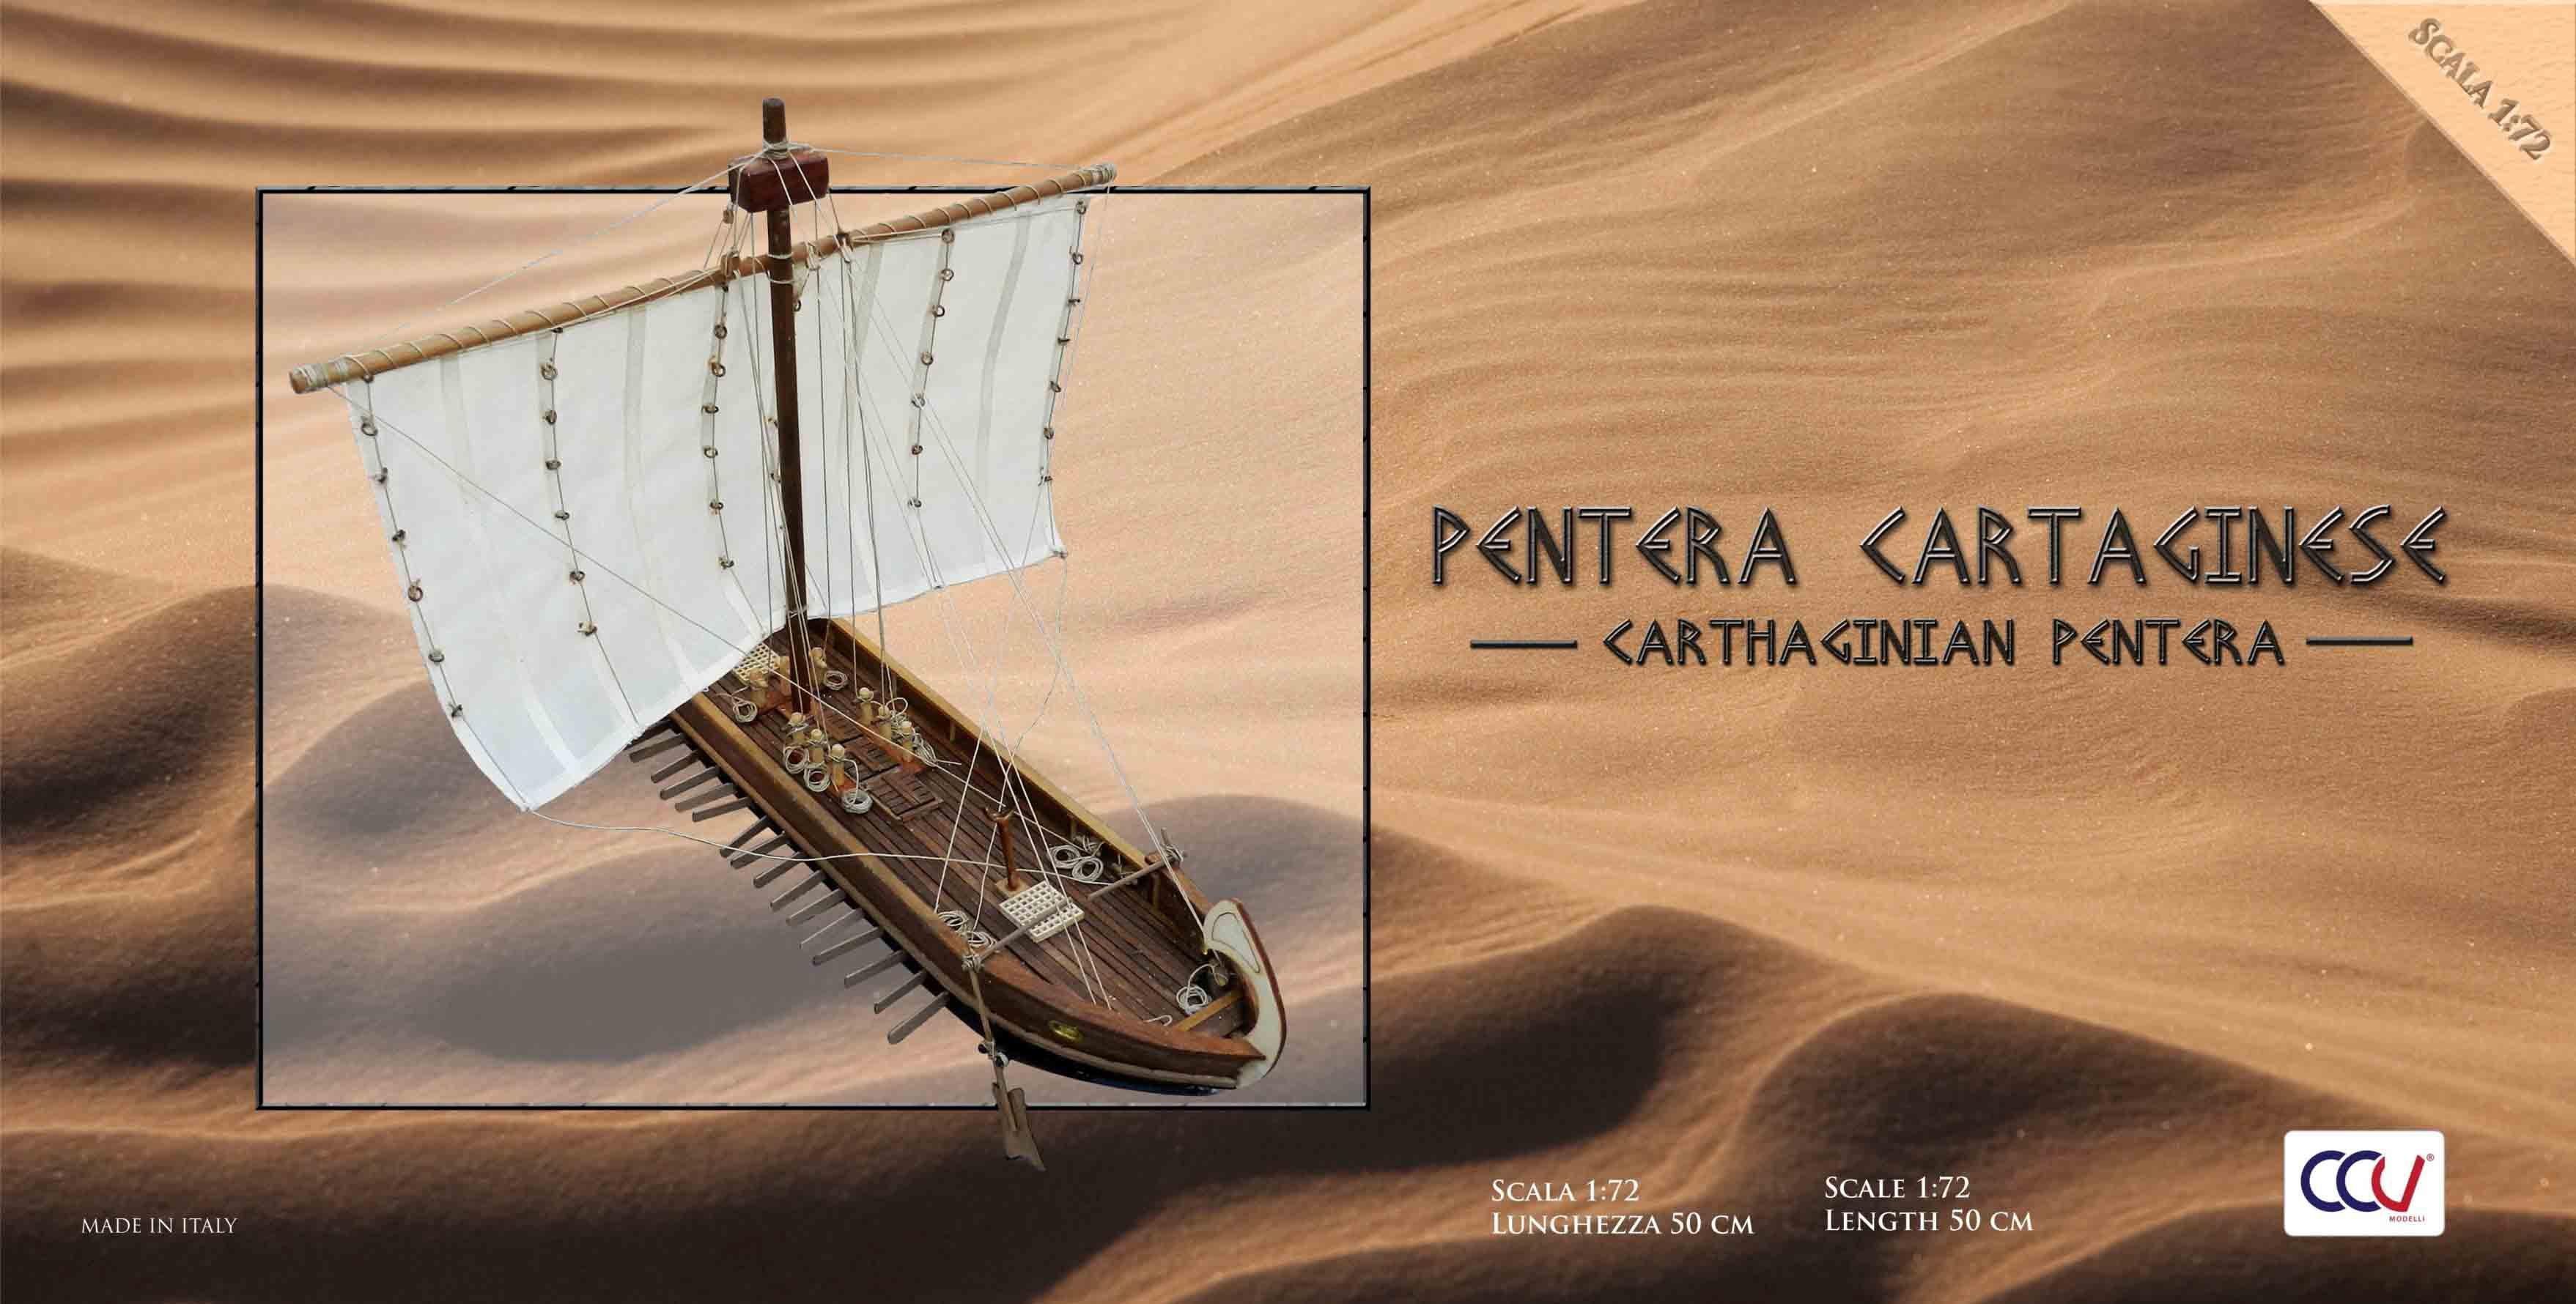 Carthaginian Pentera